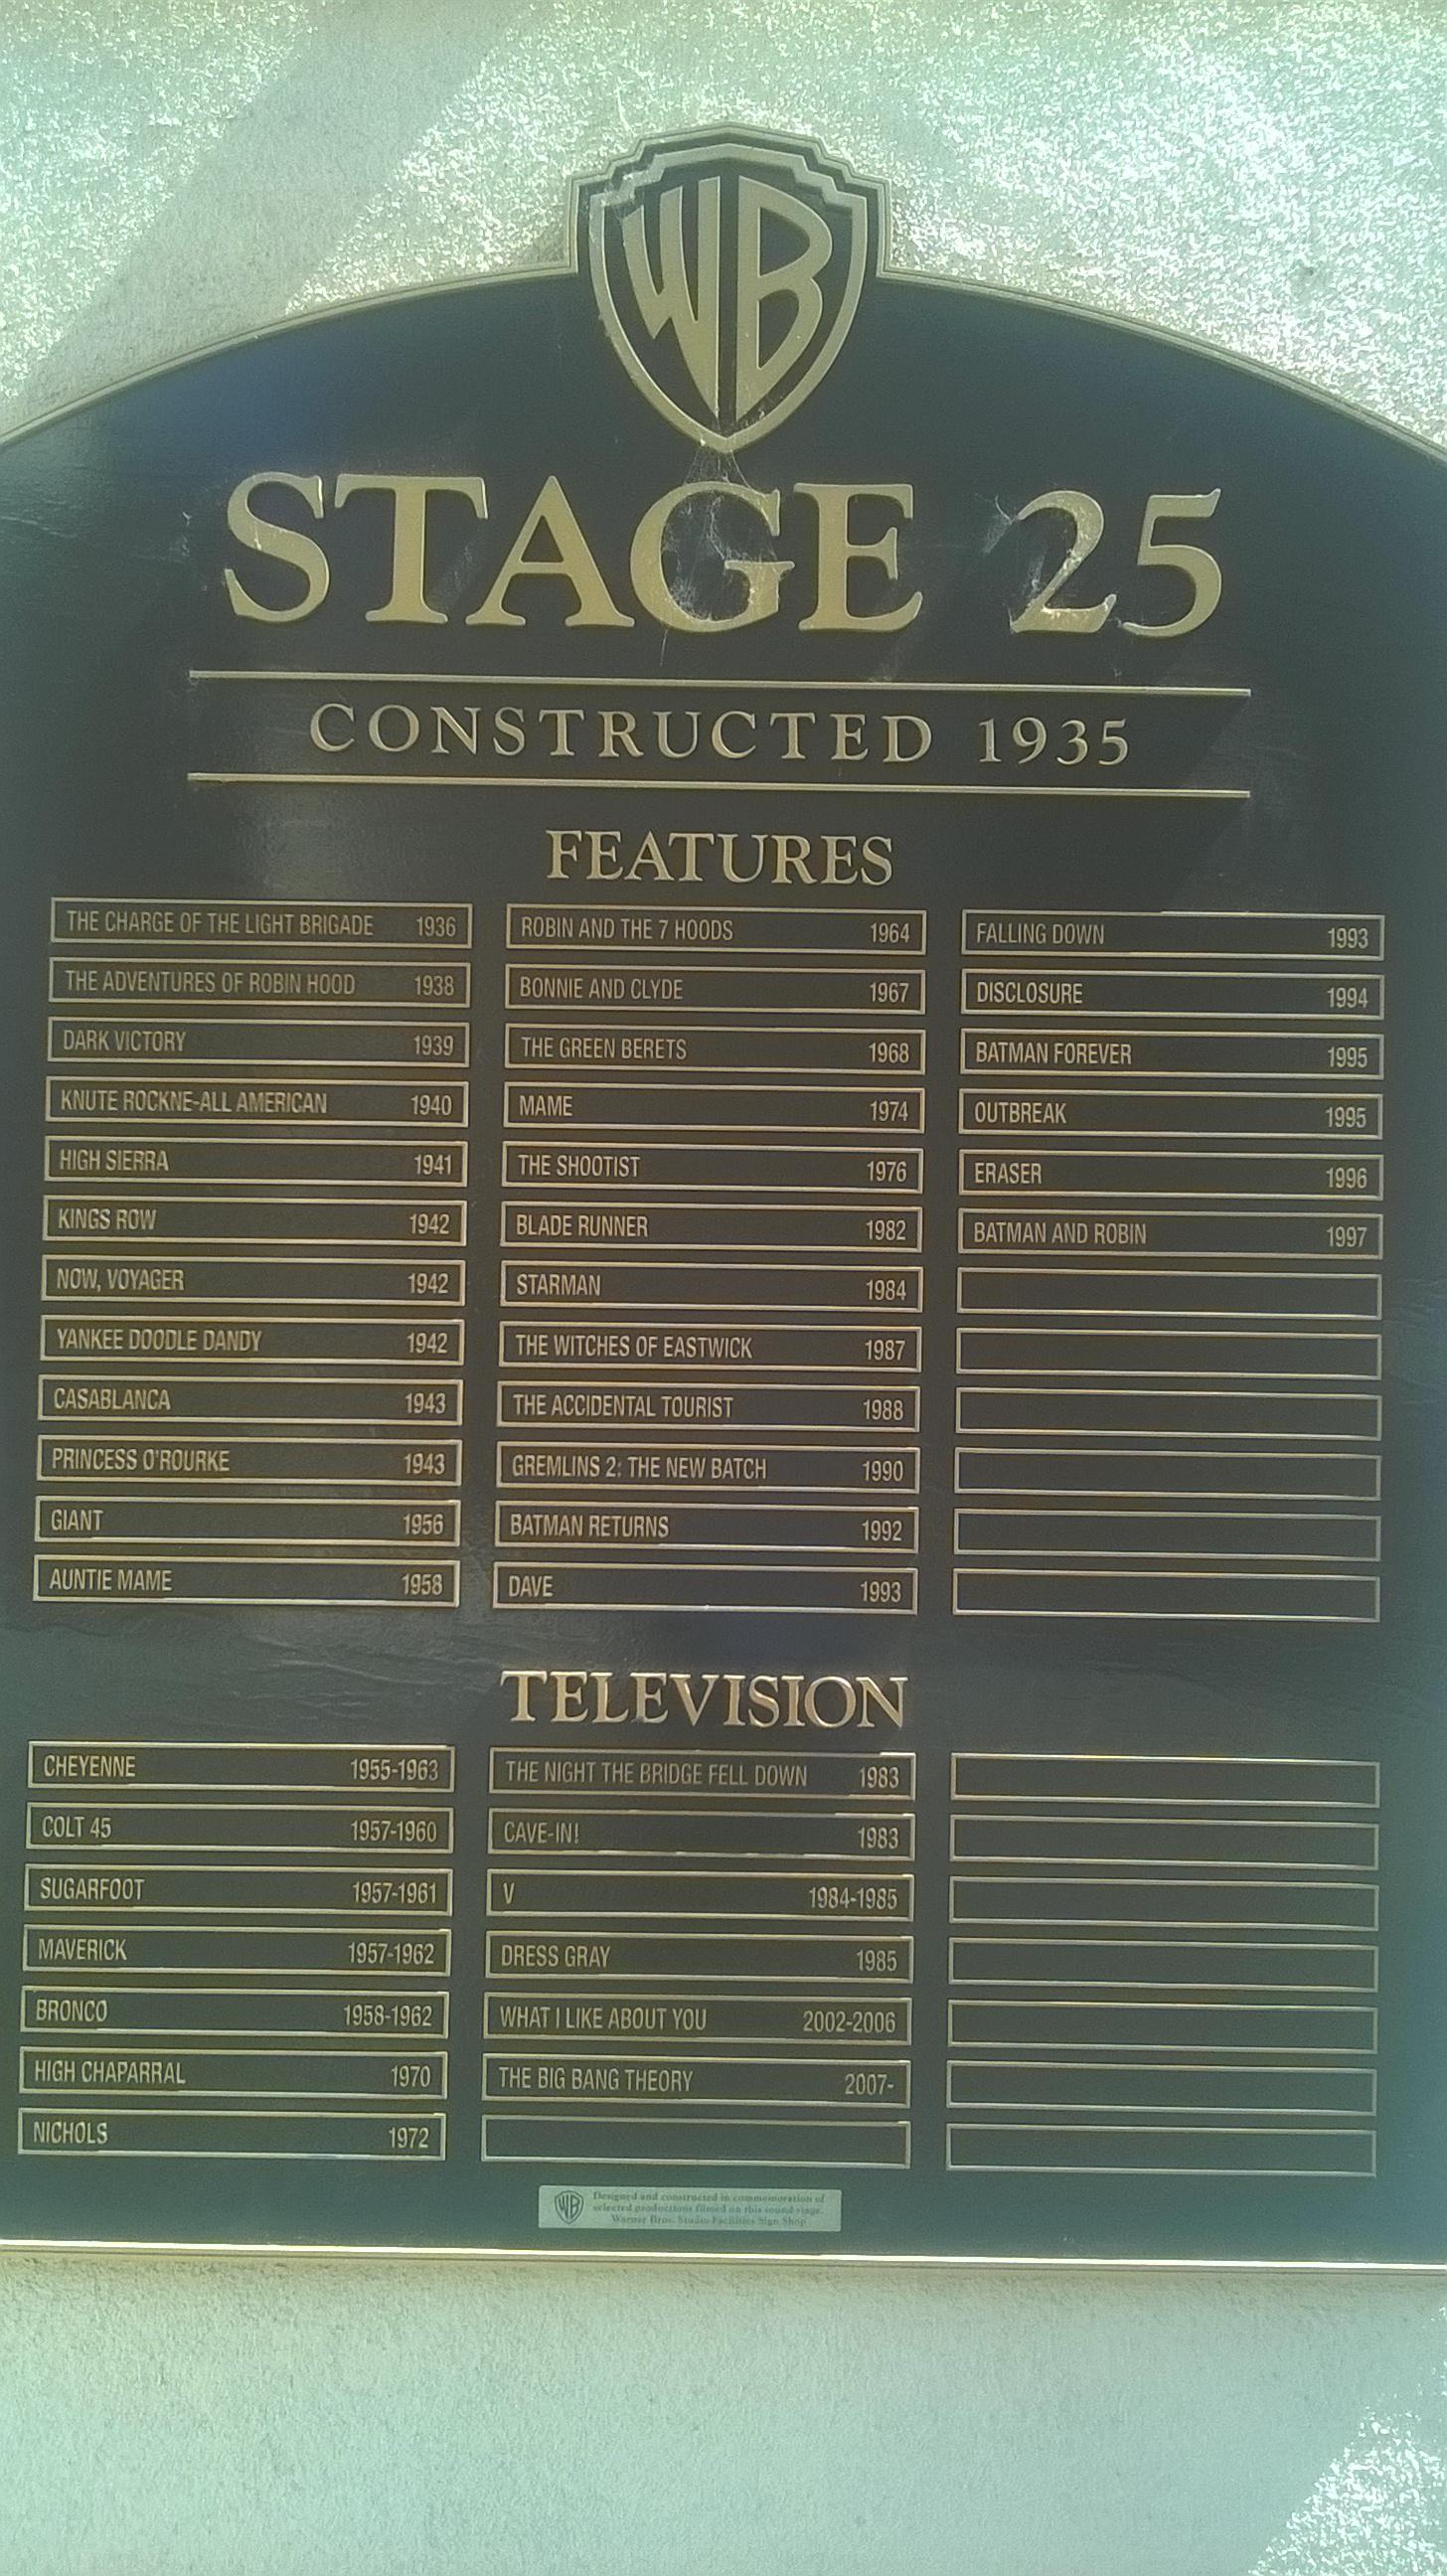 Stage 25 films Big Bang Theory